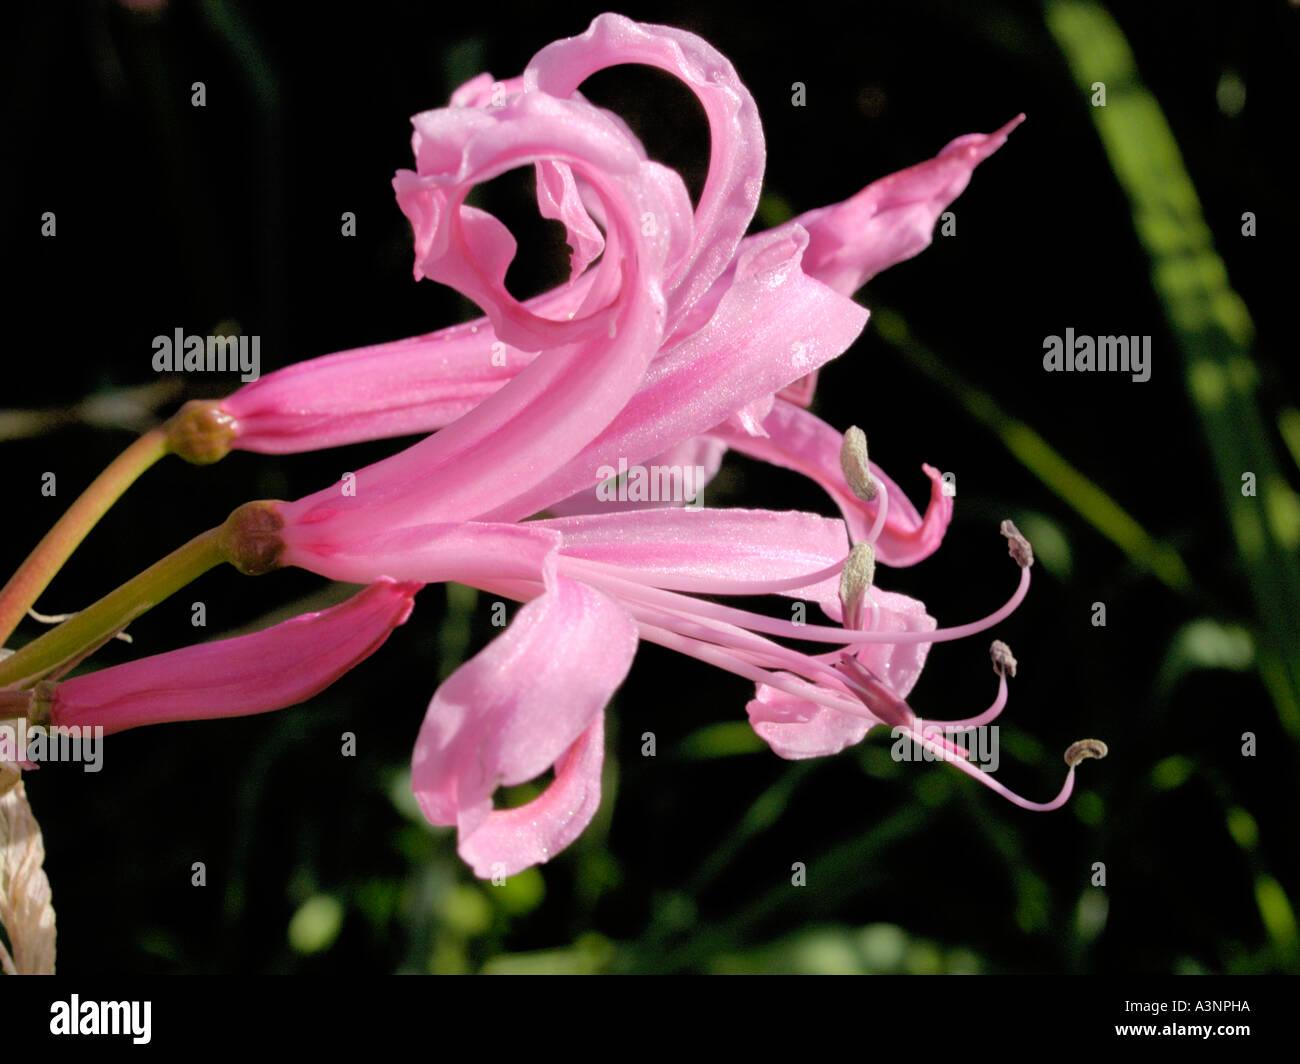 Cape Flower, Nerine bowdenii. - Stock Image